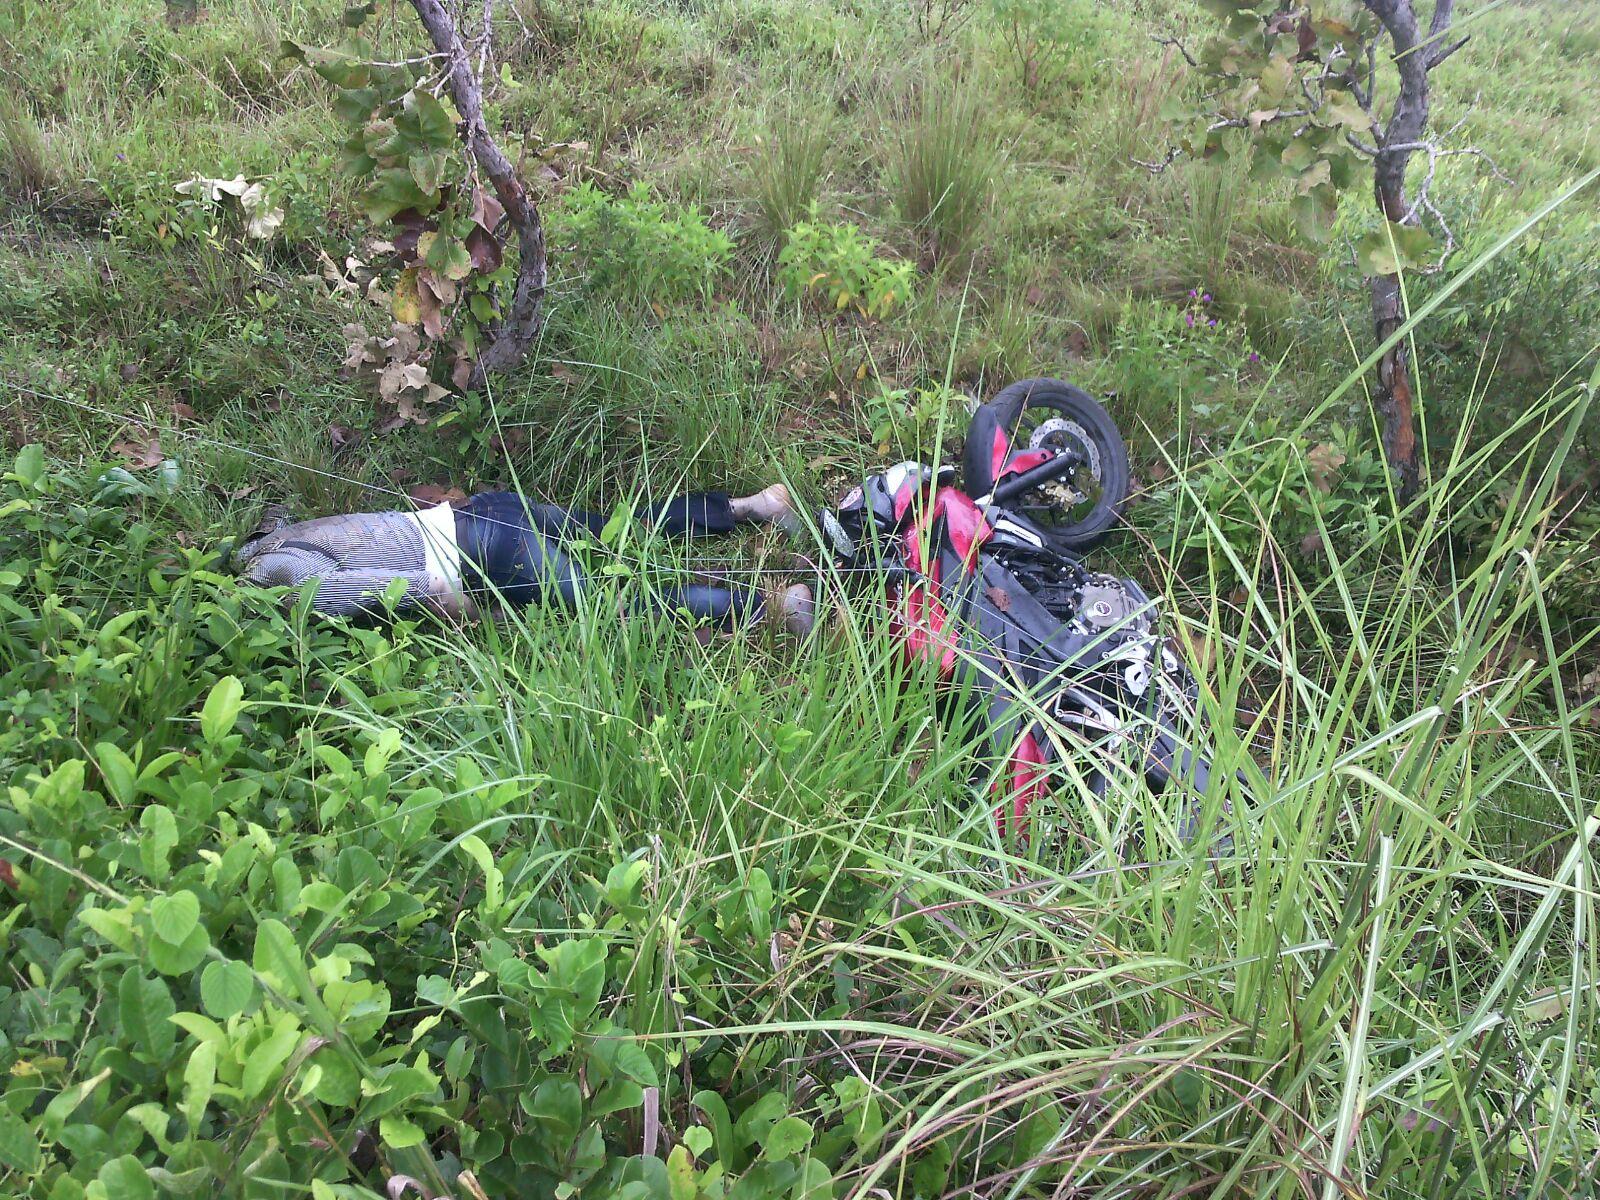 Encuentran cadáver en zona rural de Hato Corozal